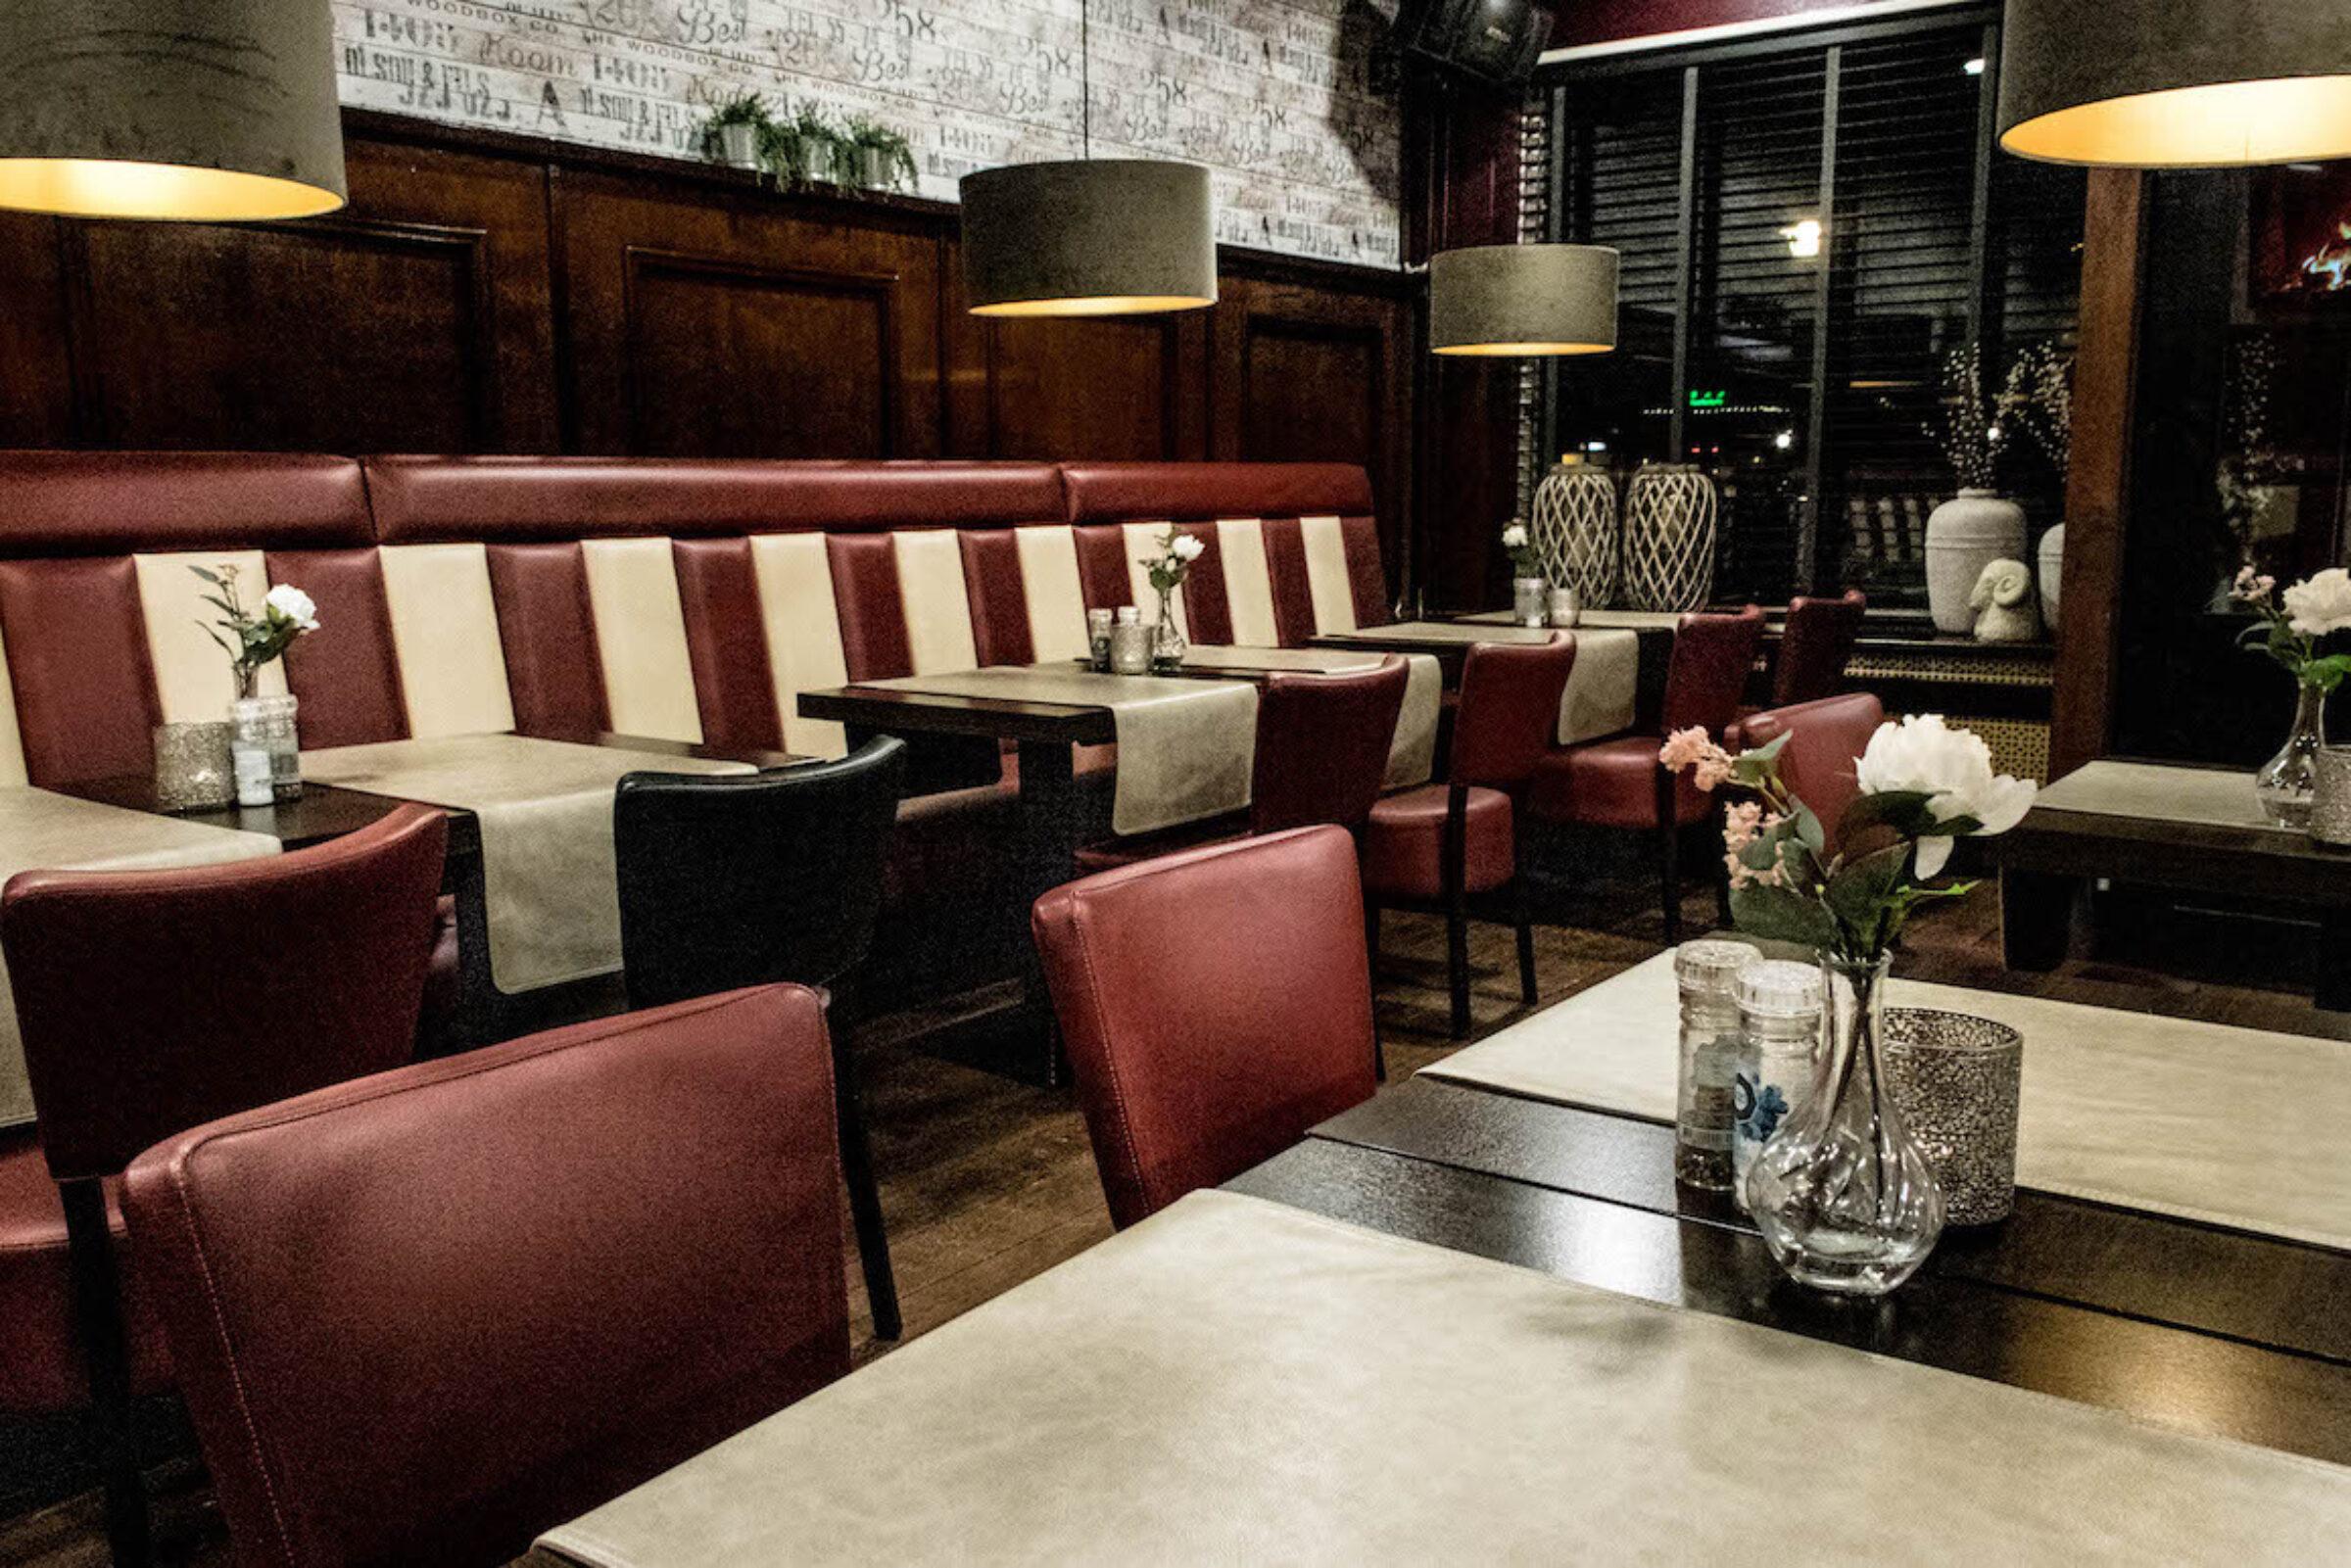 De Brasserie restaurant